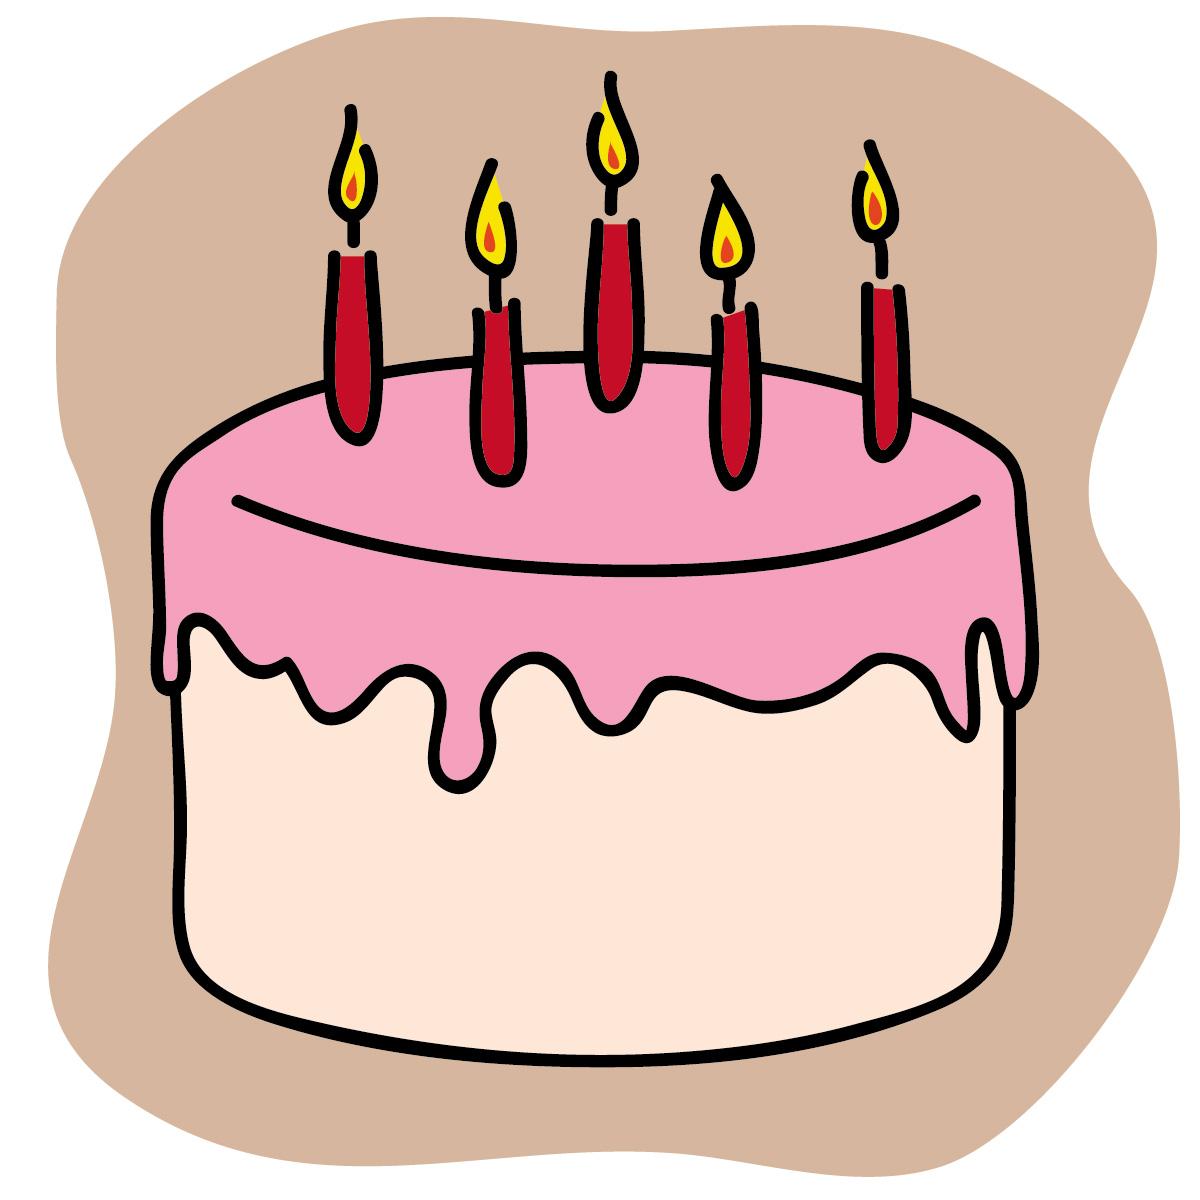 Simple clipart birthday cake #5